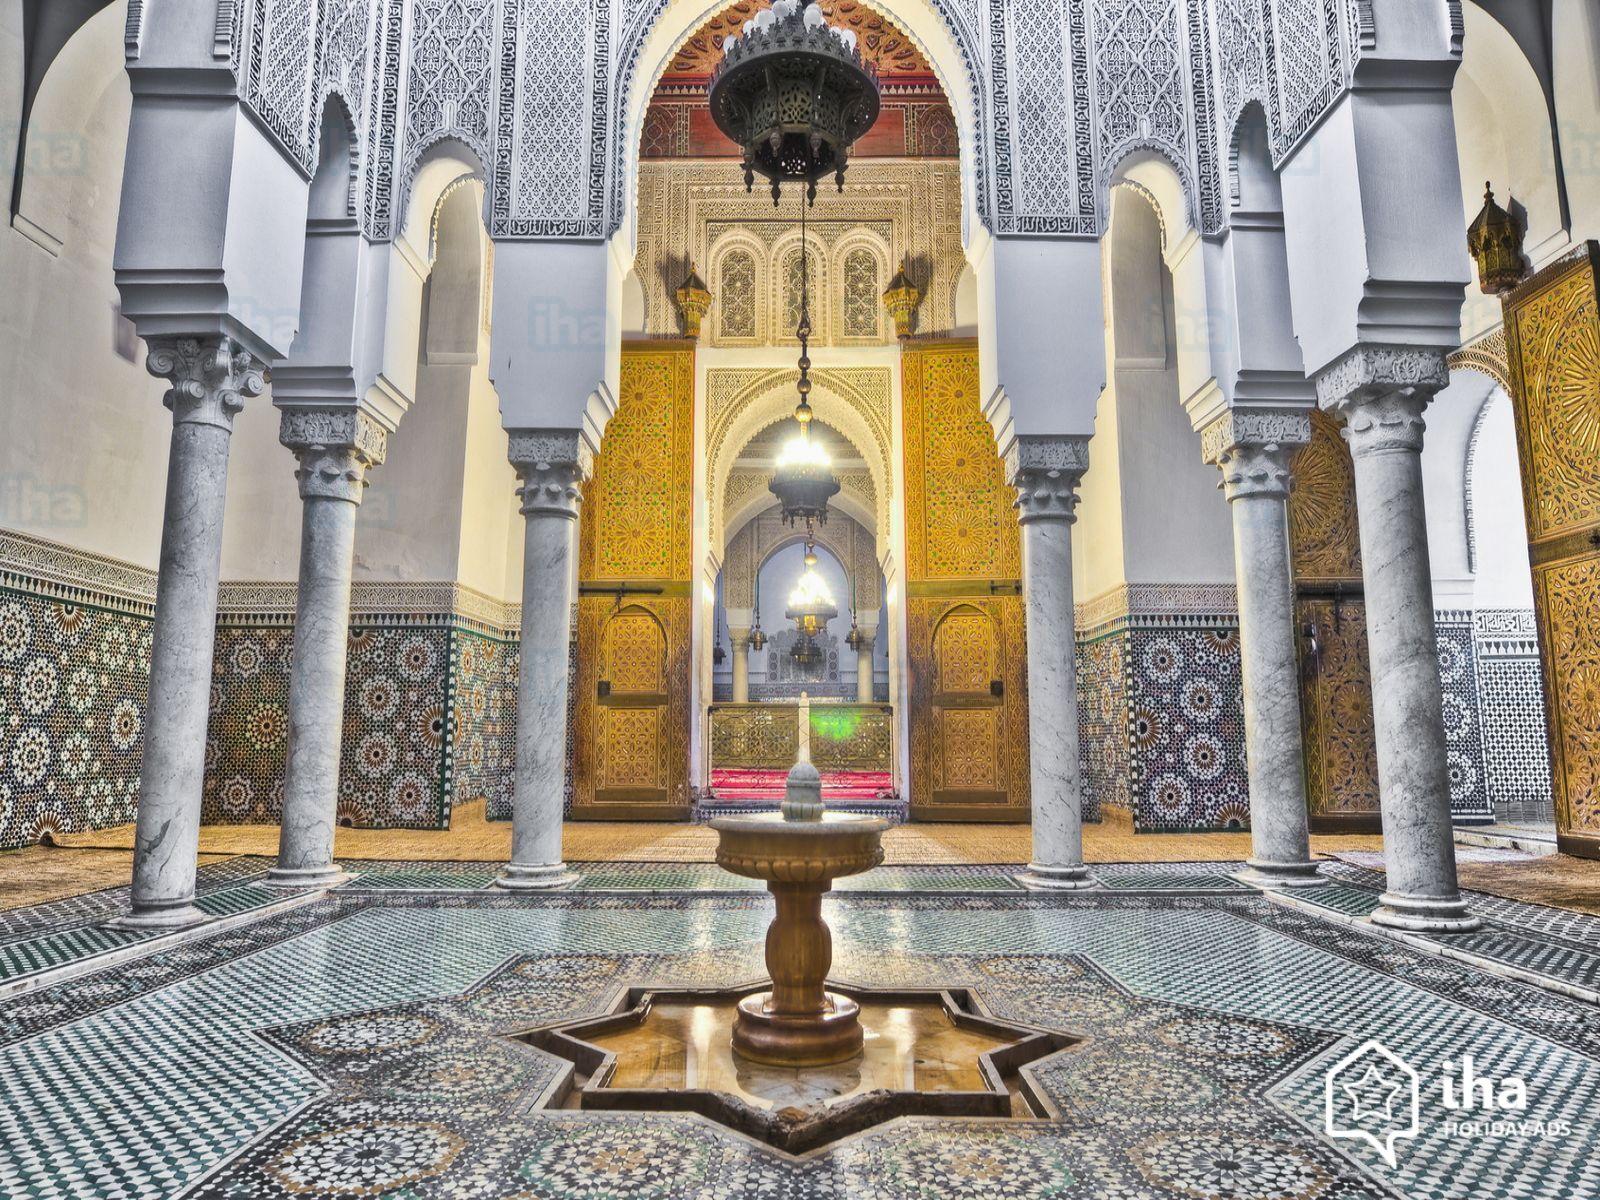 Meknes-Mausolee-de-moulay-ismail-a-meknes